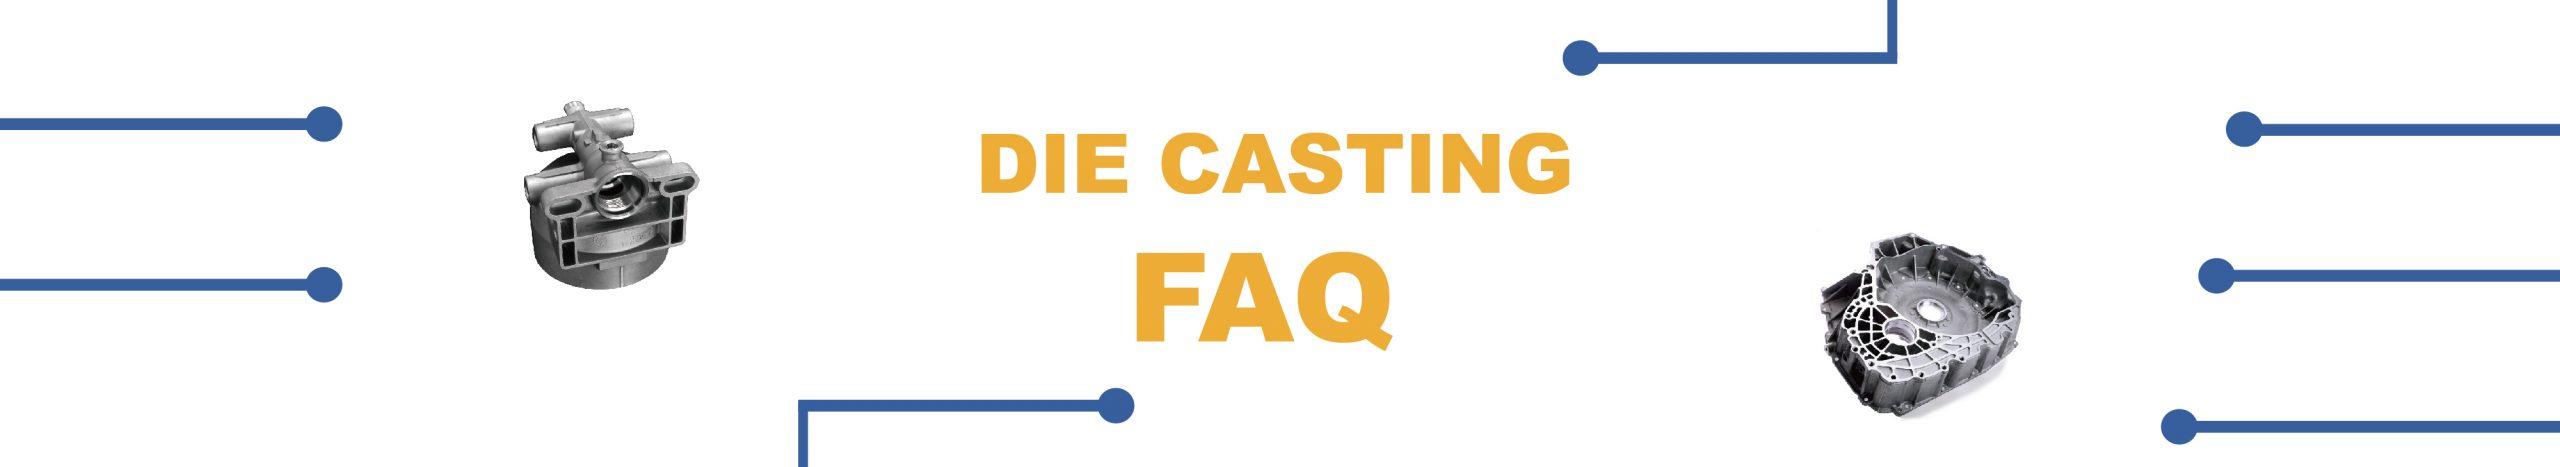 Die casting banner